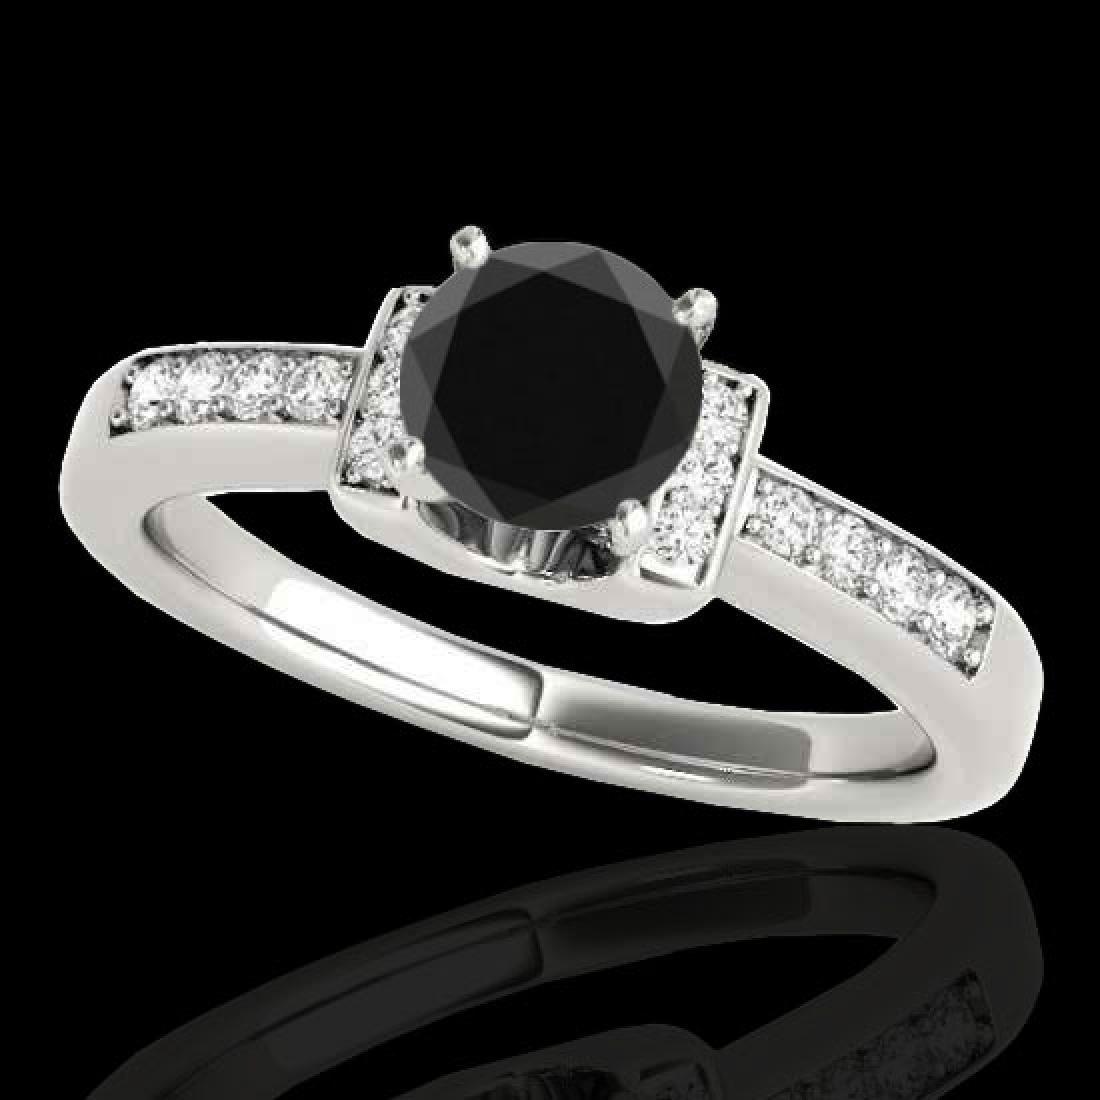 1.11 CTW Certified VS Black Diamond Solitaire Ring 10K